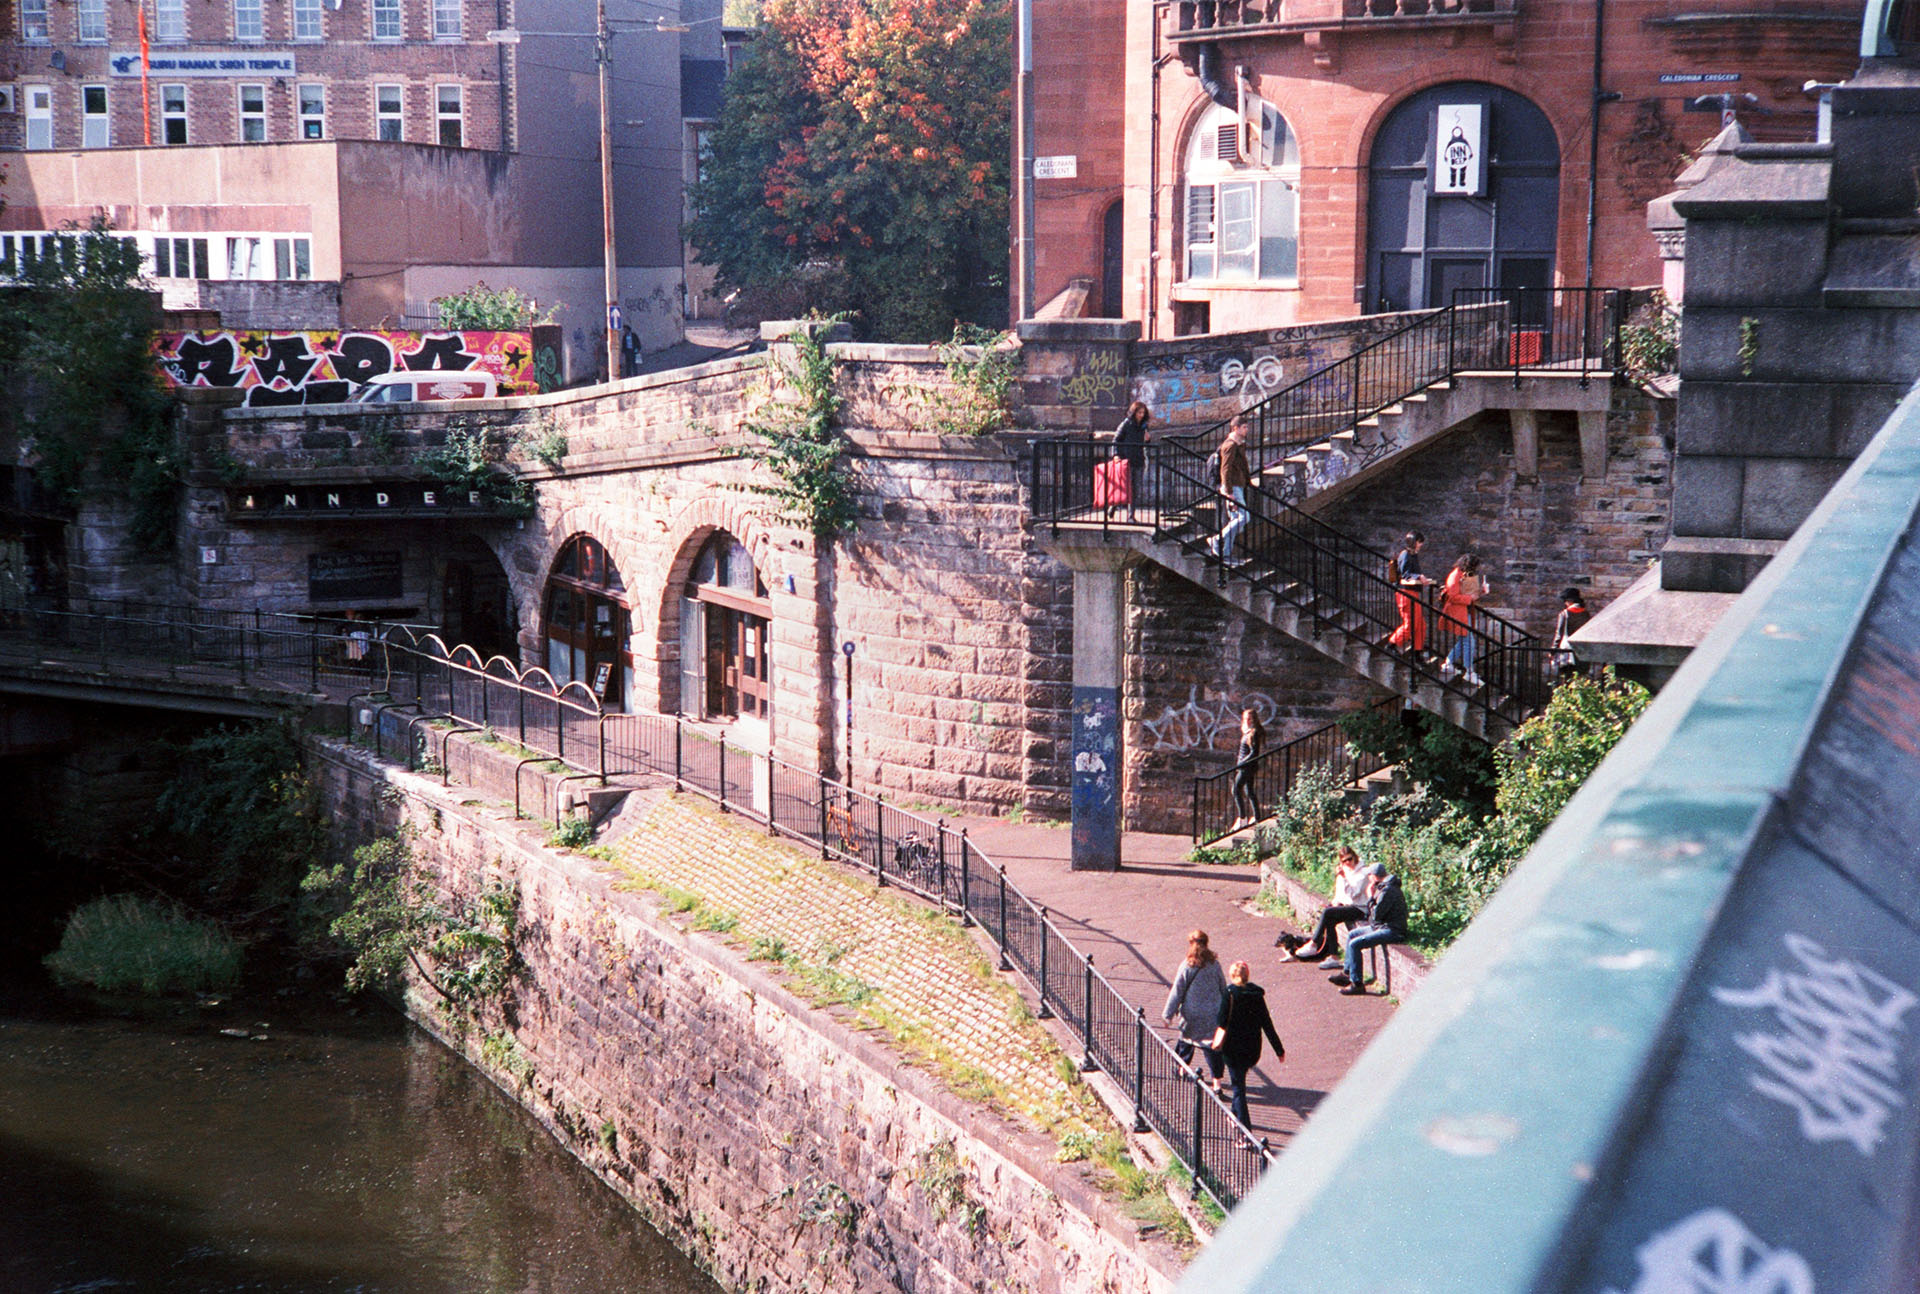 Glasgow colour 35mm street photography